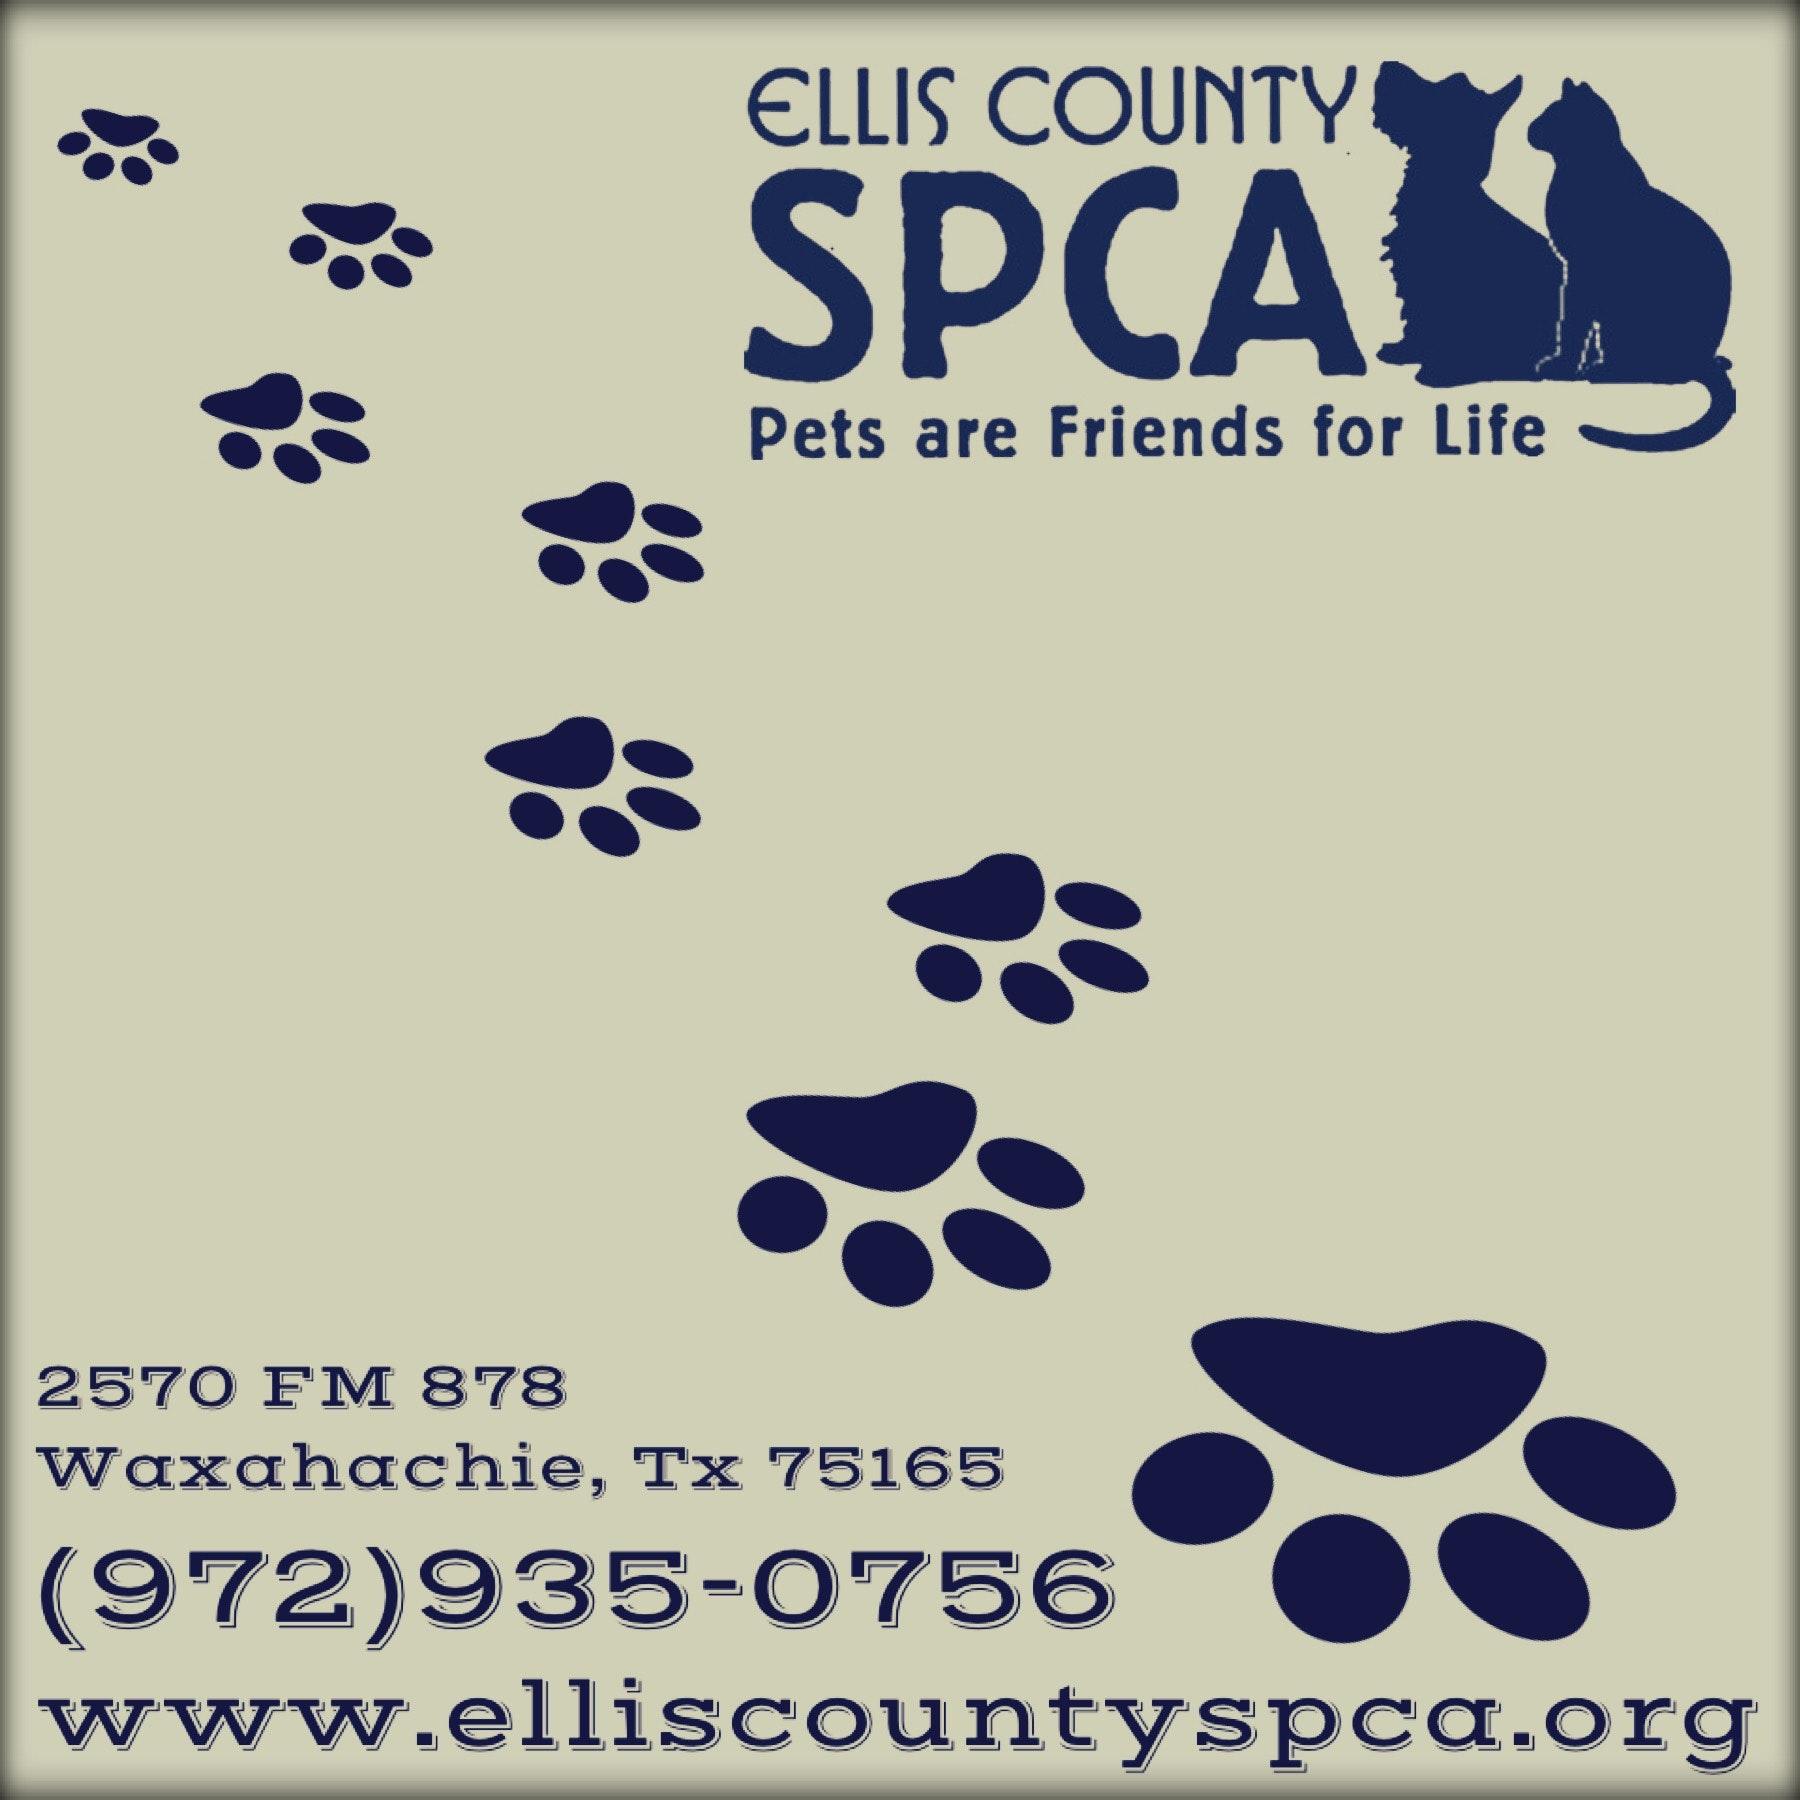 Furry Friend Fund / ECSPCA